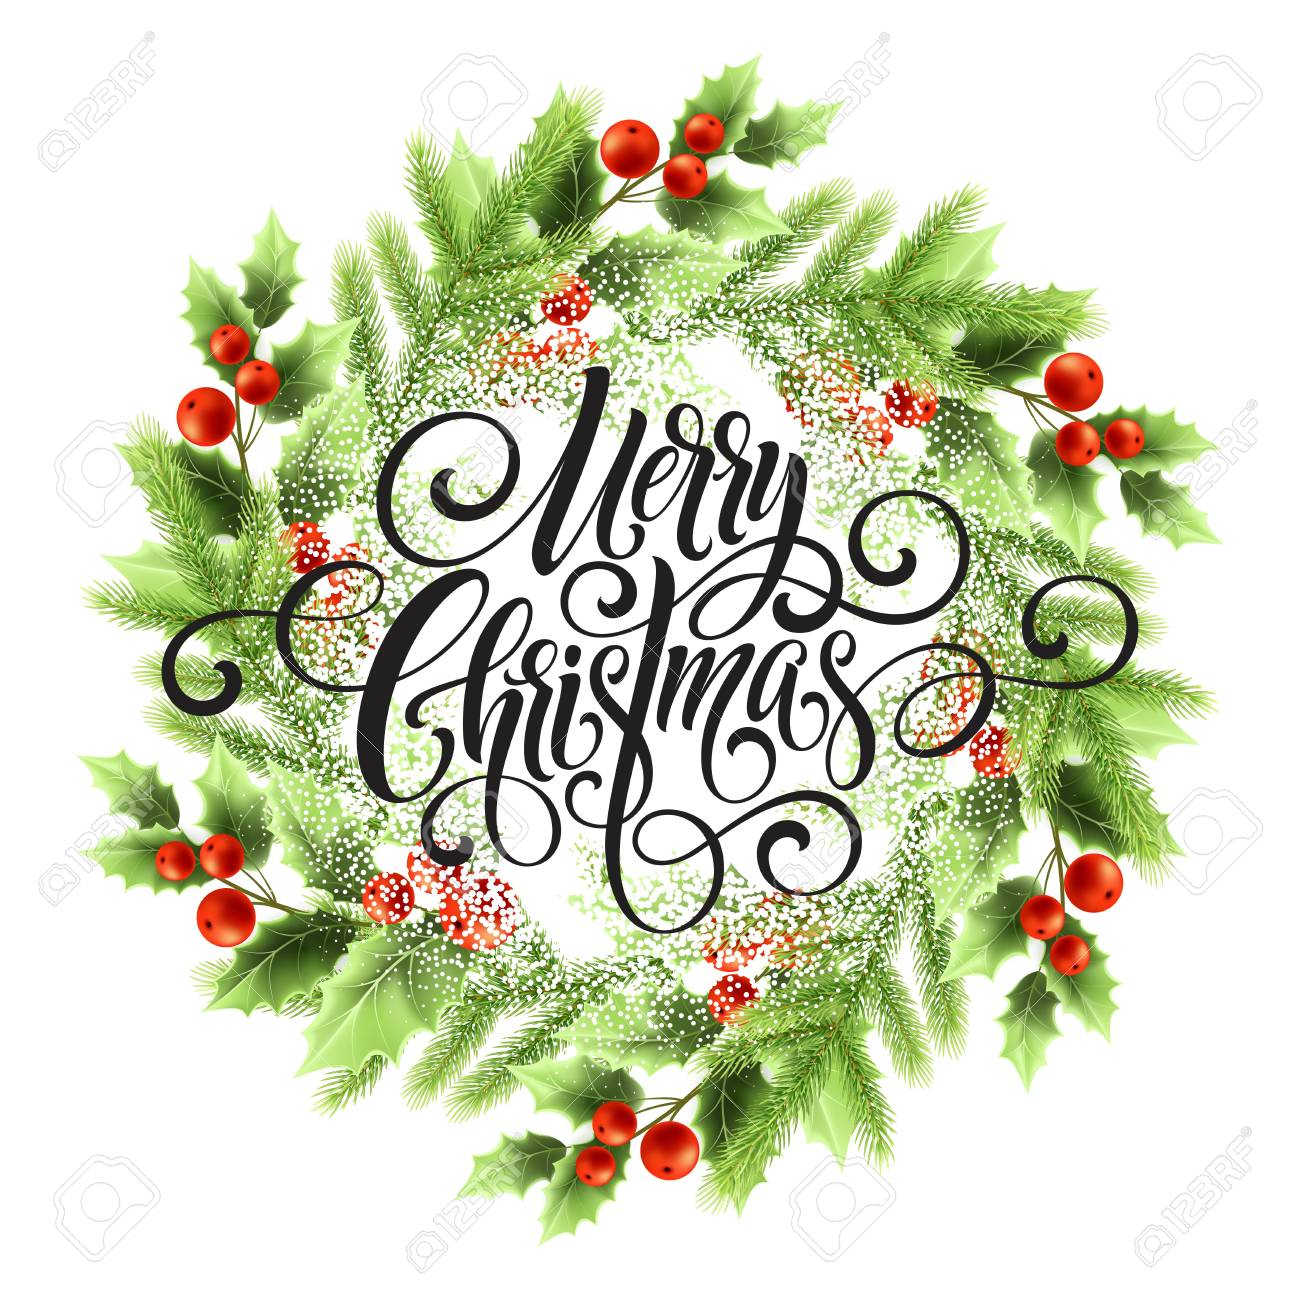 Merry Christmas Lettering.Merry Christmas Lettering In Mistletoe Wreath Christmas Round